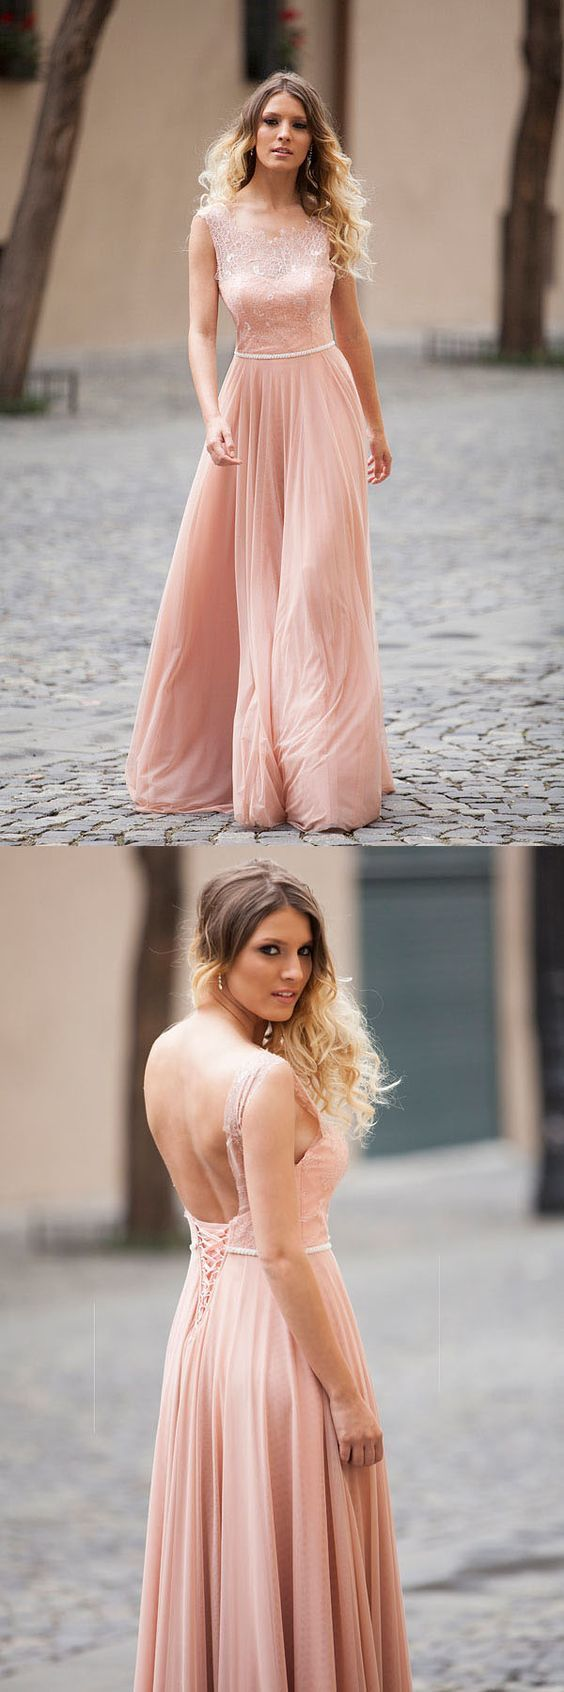 Elegant A-line Blush Pink Sleeveless Lace Prom/Evening Dresses